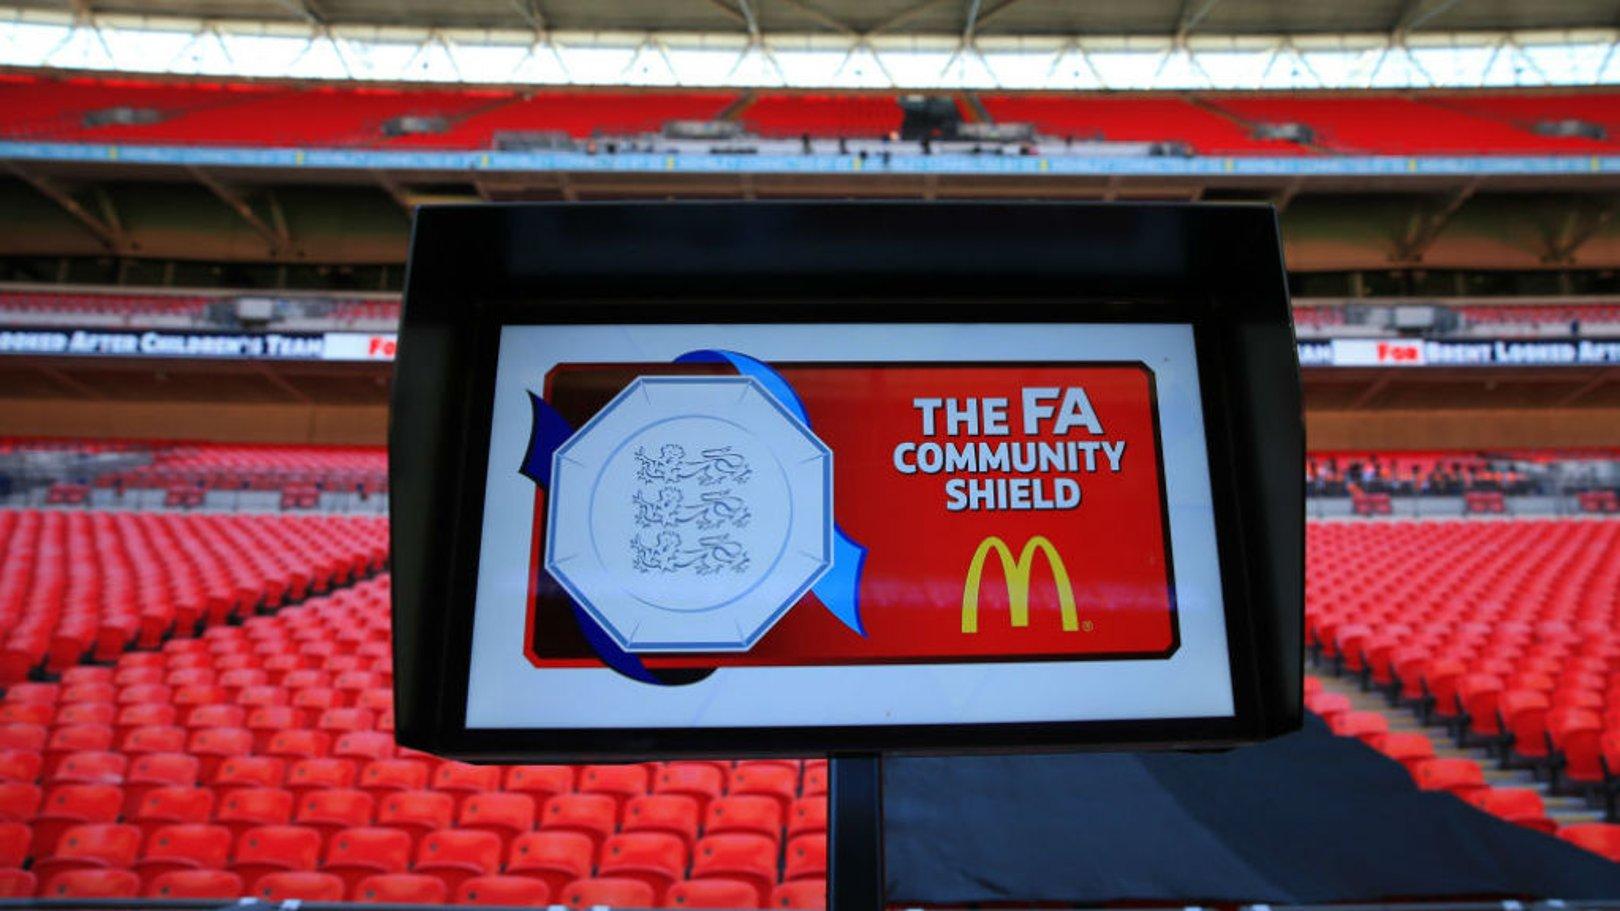 FA Community Shield Ticket Information